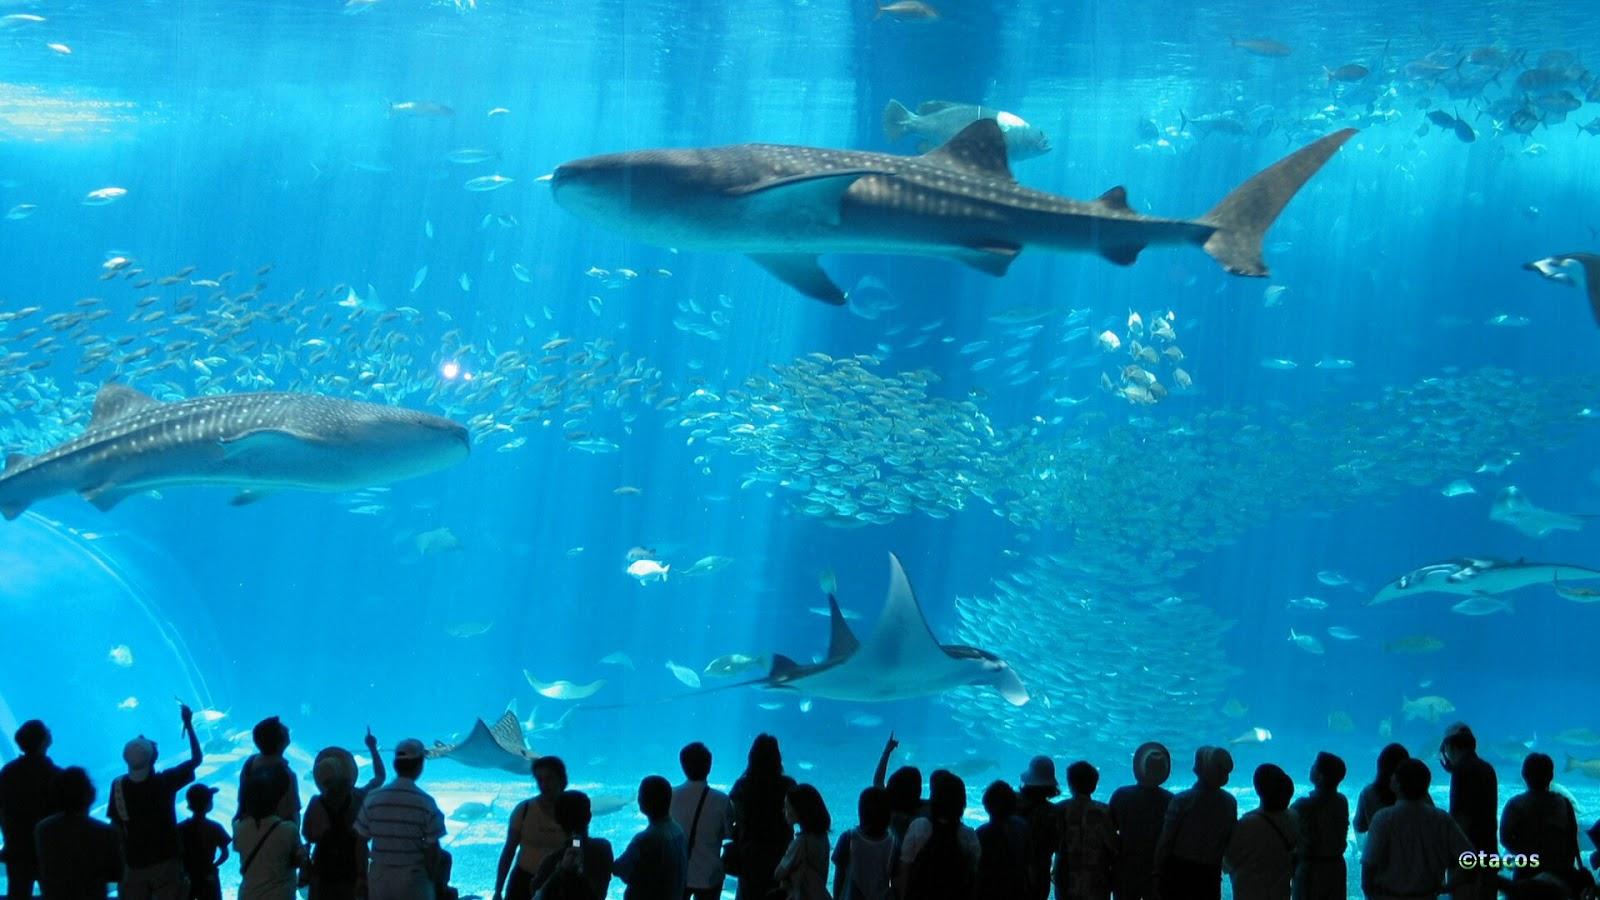 Okinawa Churaumi Aquarium in Japan   Facts Pod